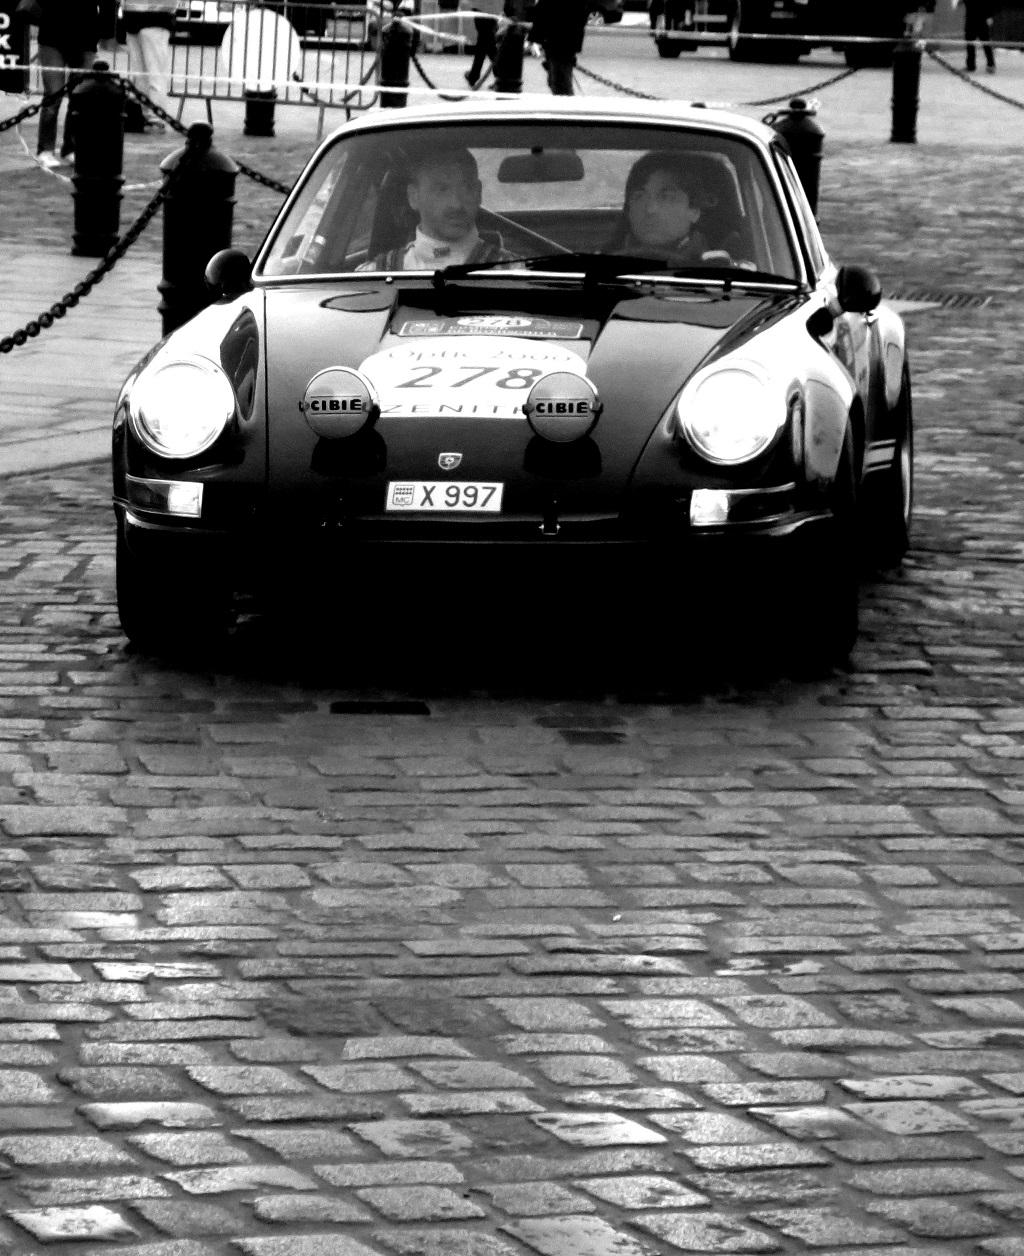 Roddaro-Antonacci - Porsche-911-2.3-L-ST - 2017 - Saint-Malo - Tour-Auto - Photo-Thierry-Le-Bras